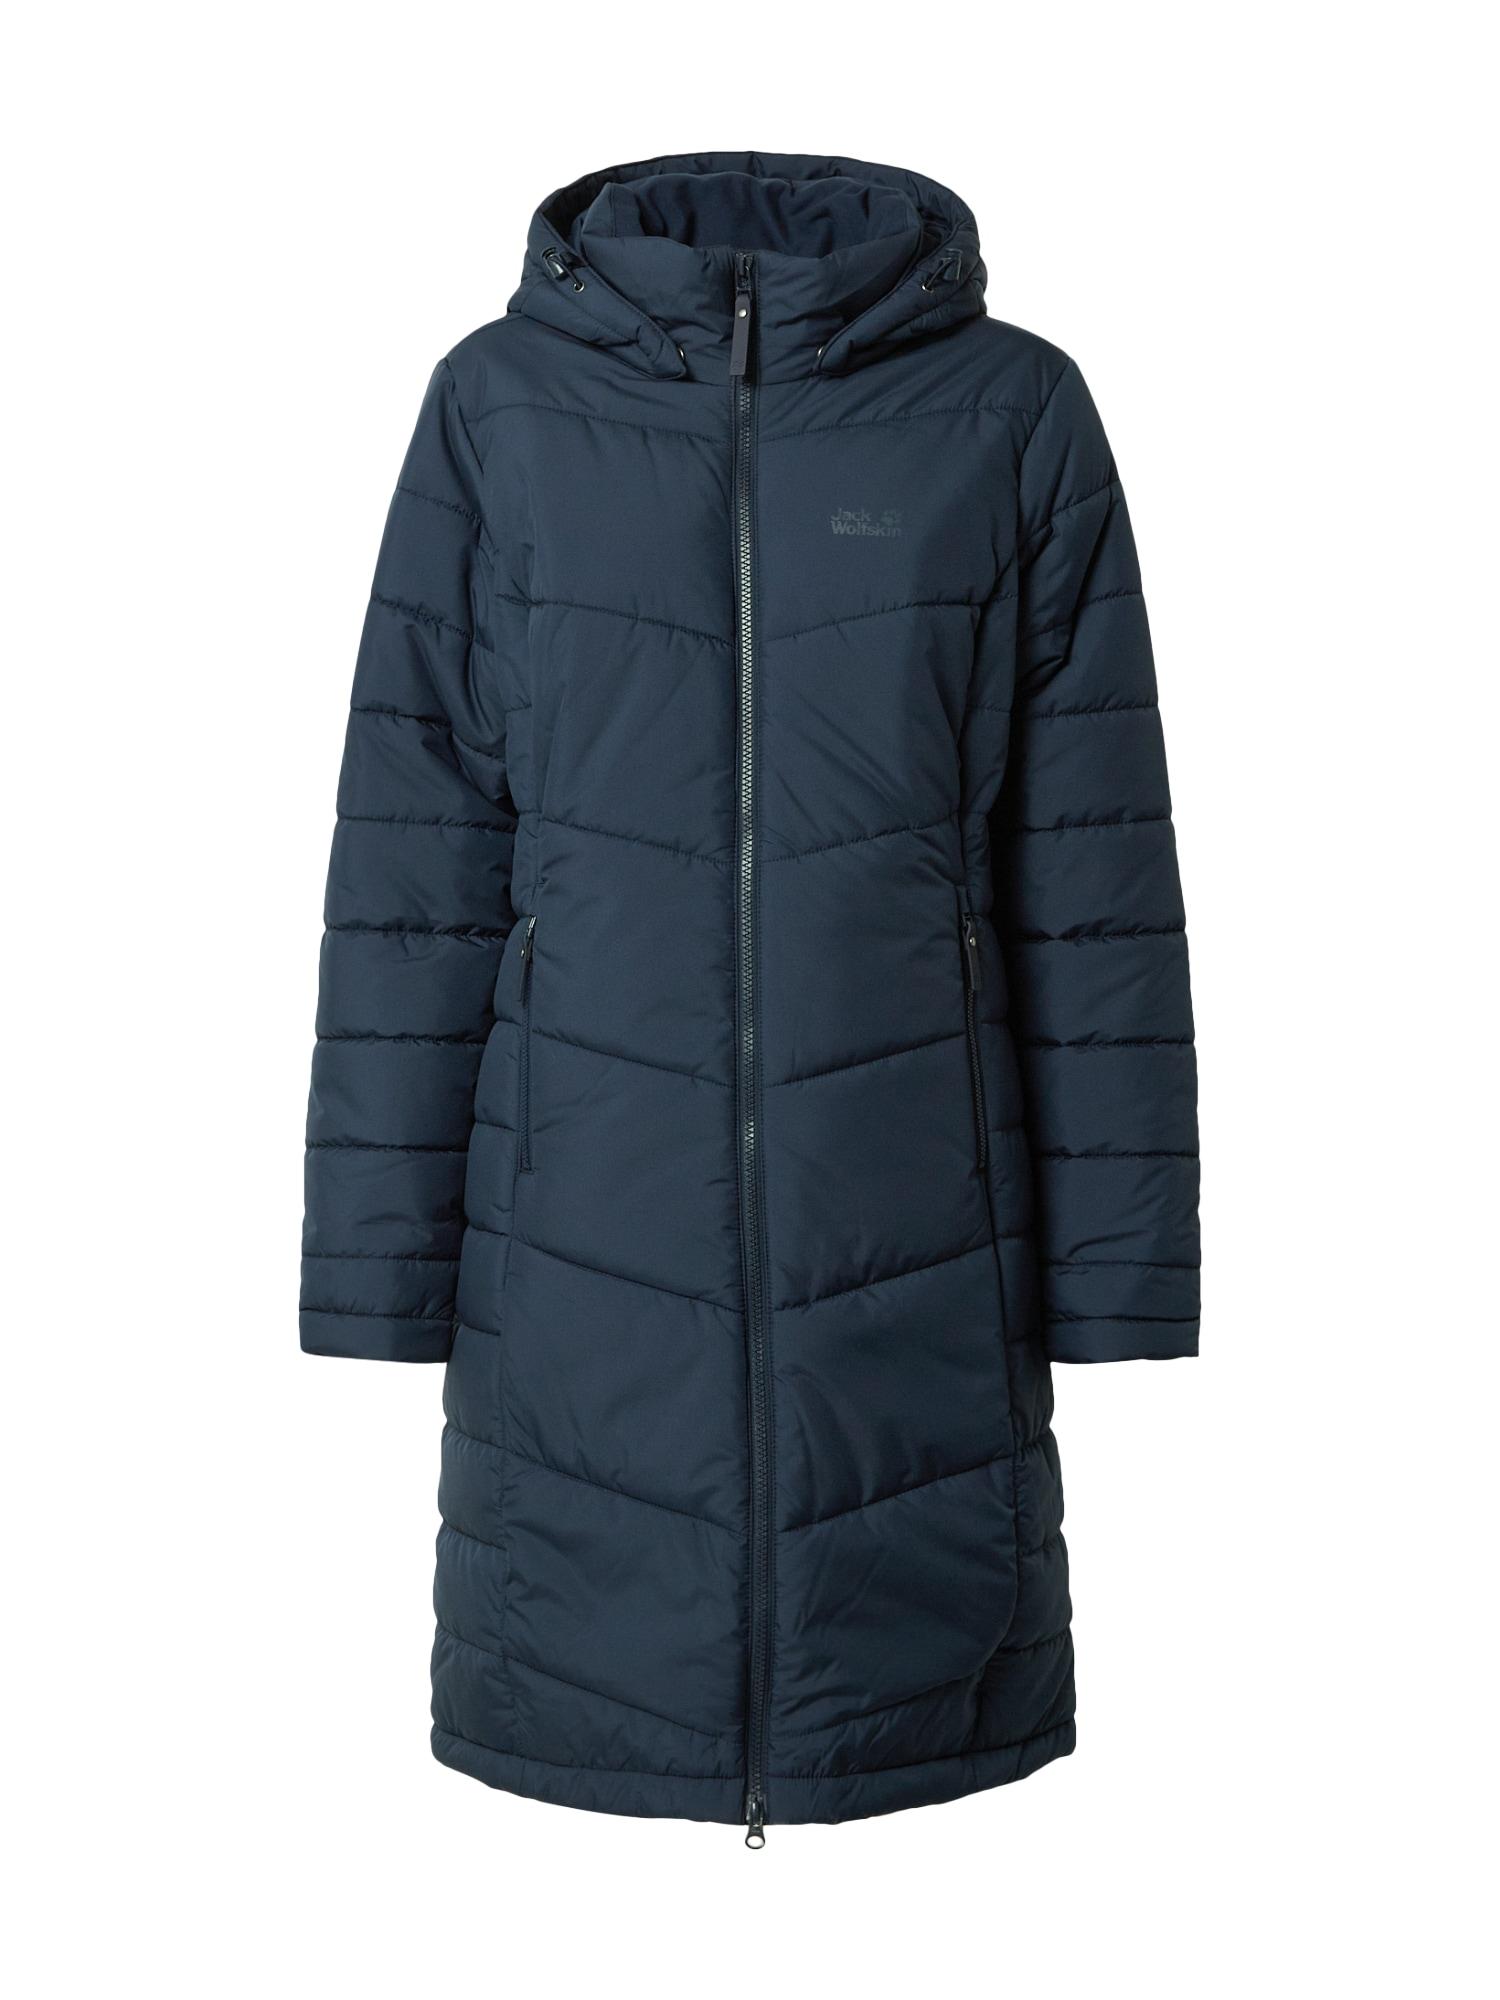 JACK WOLFSKIN Zimní kabát 'North York'  modrá / tmavě modrá